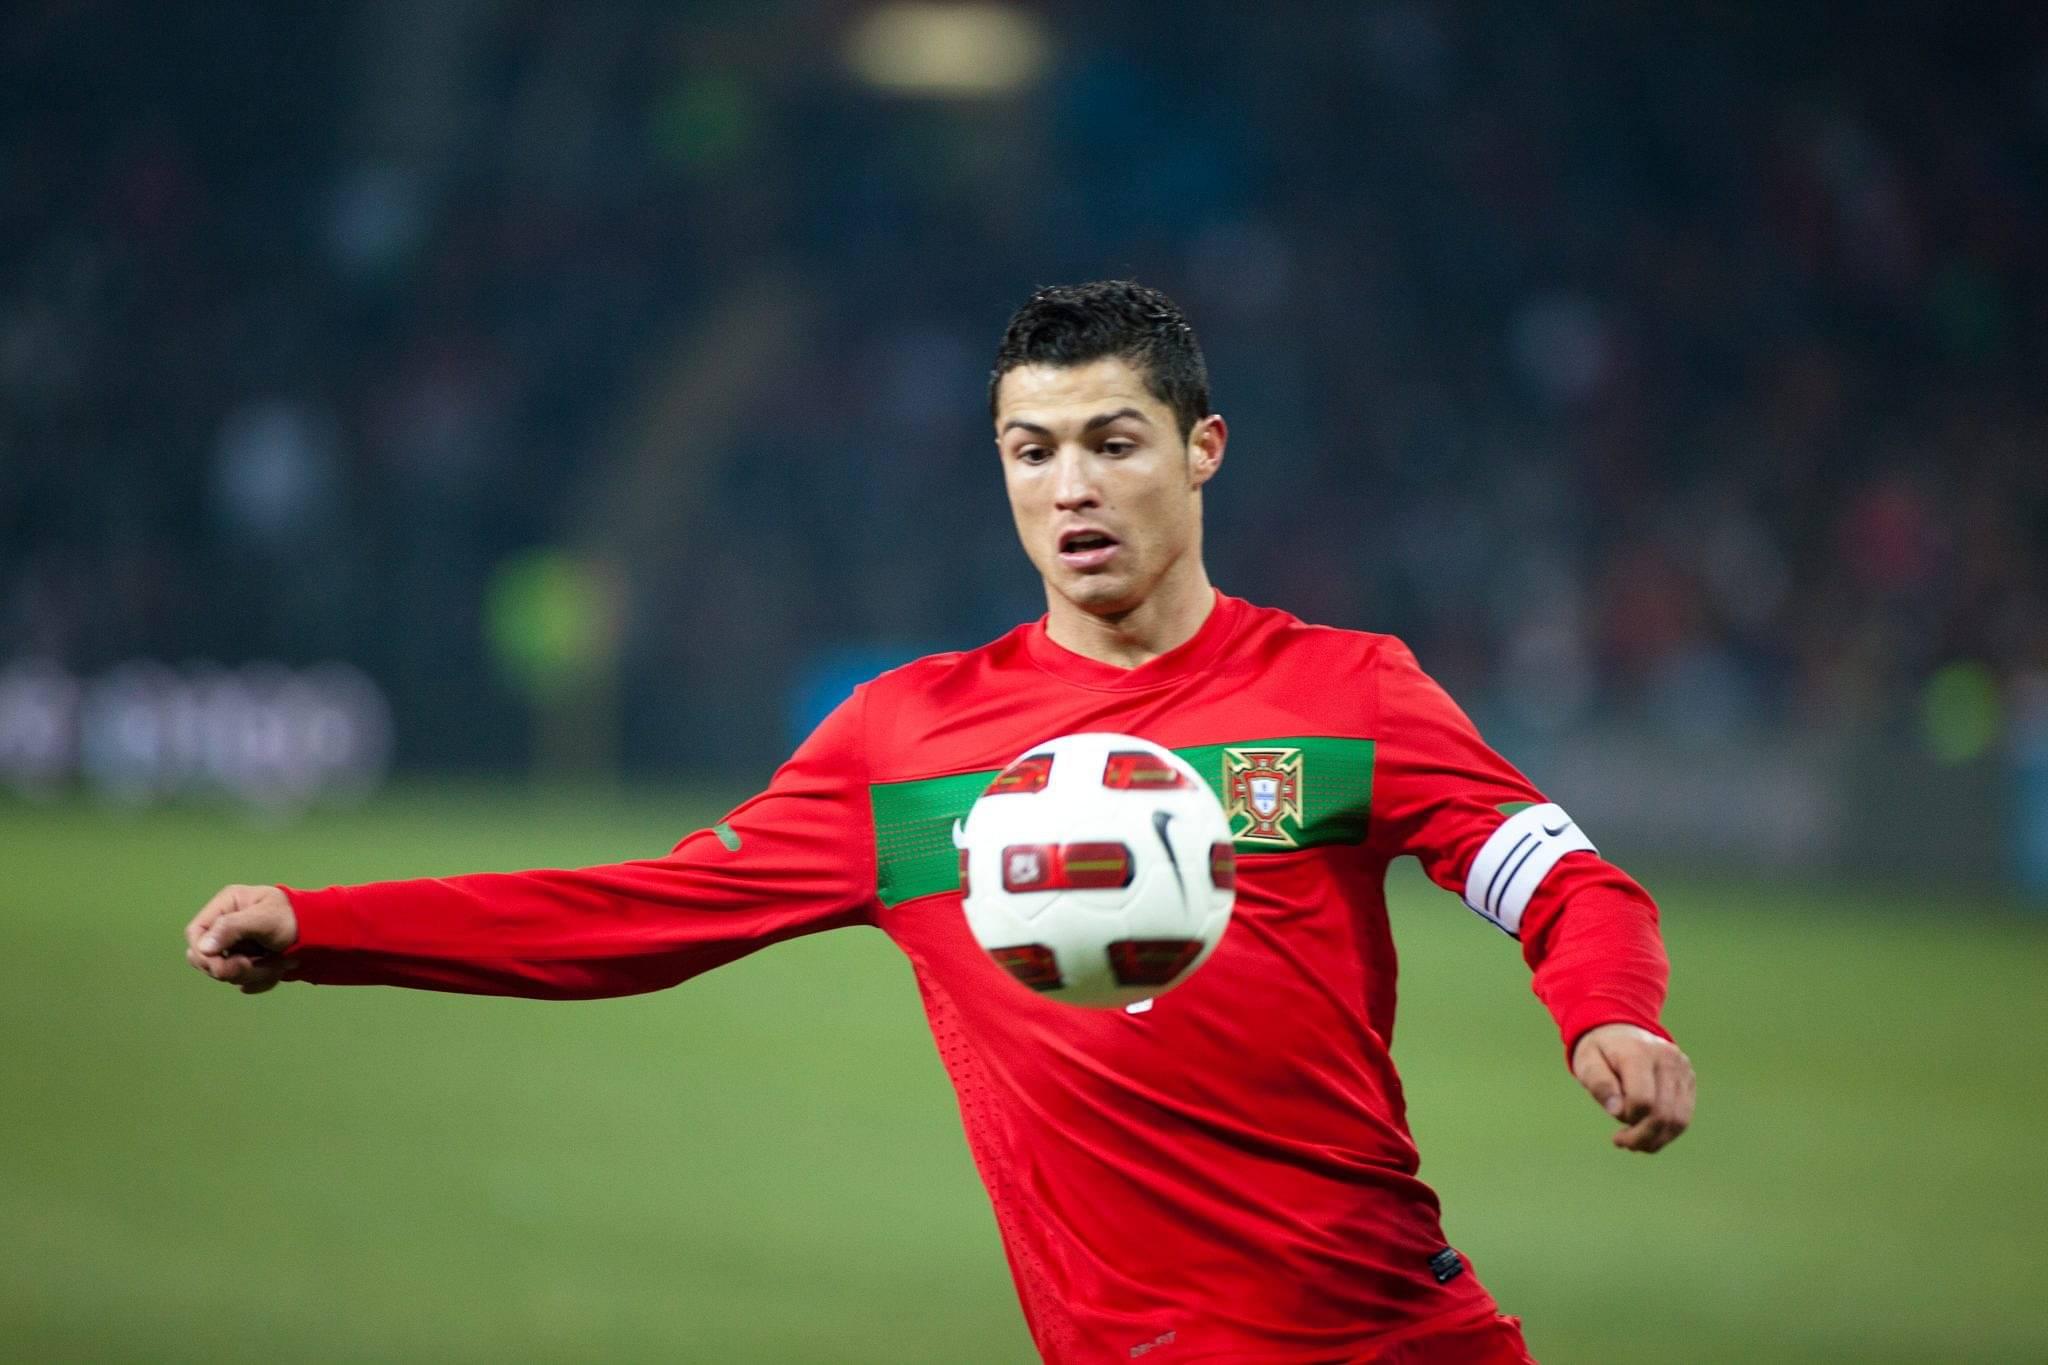 Cristiano Ronaldo will play a key role in Hungary vs Portugal